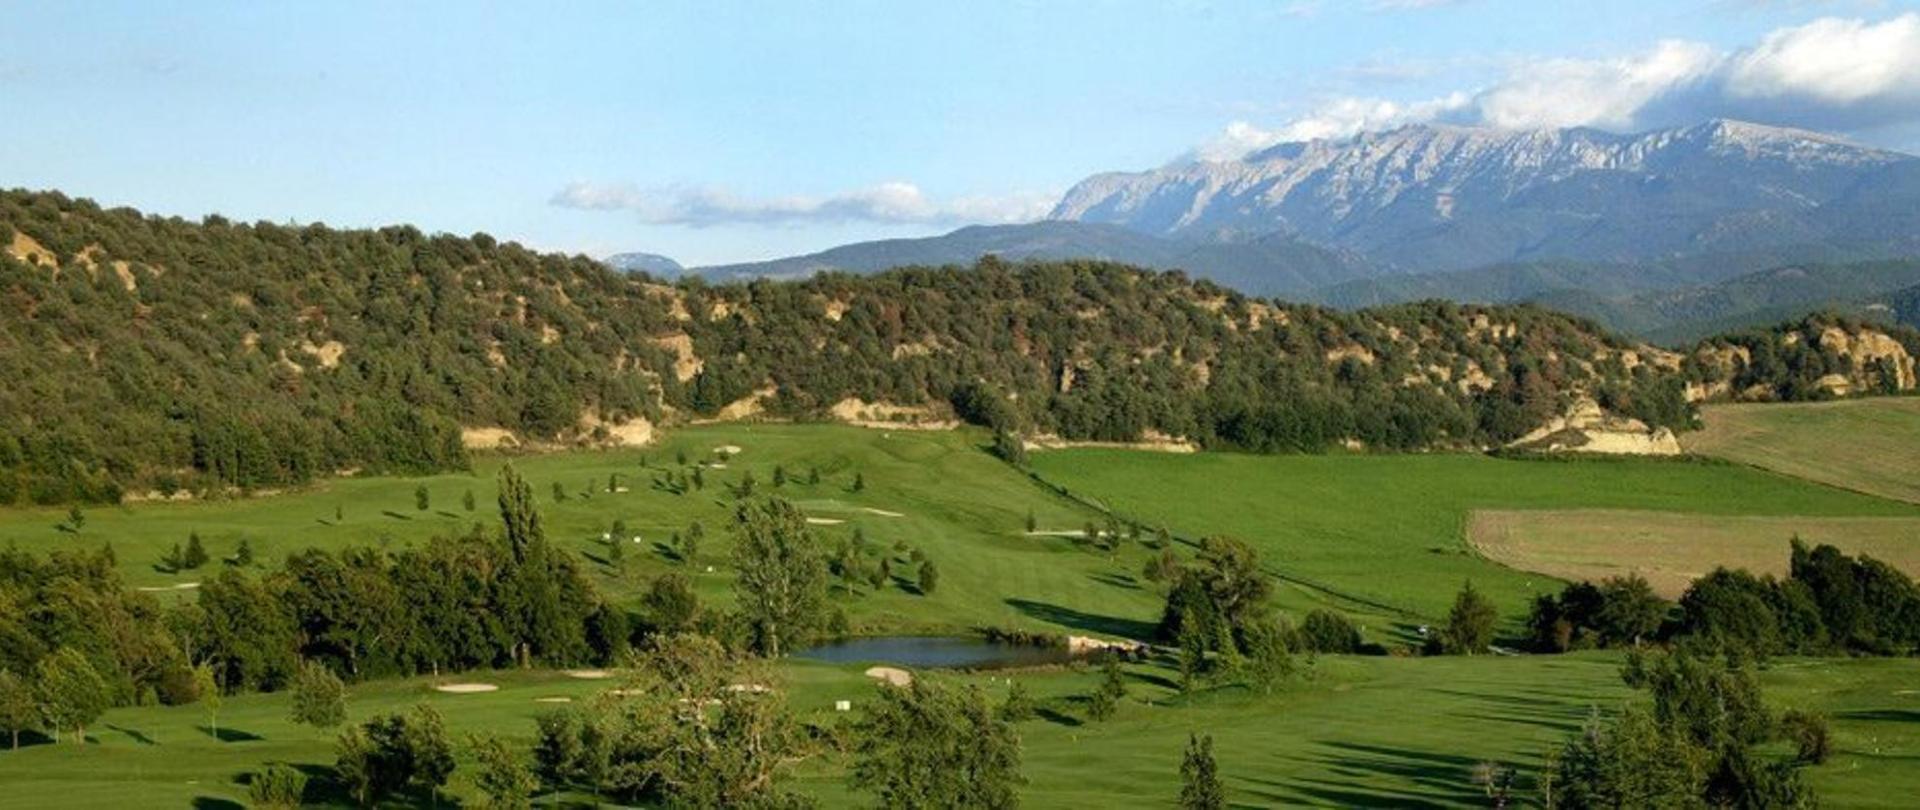 golfturismo_foto1_aravell.jpg